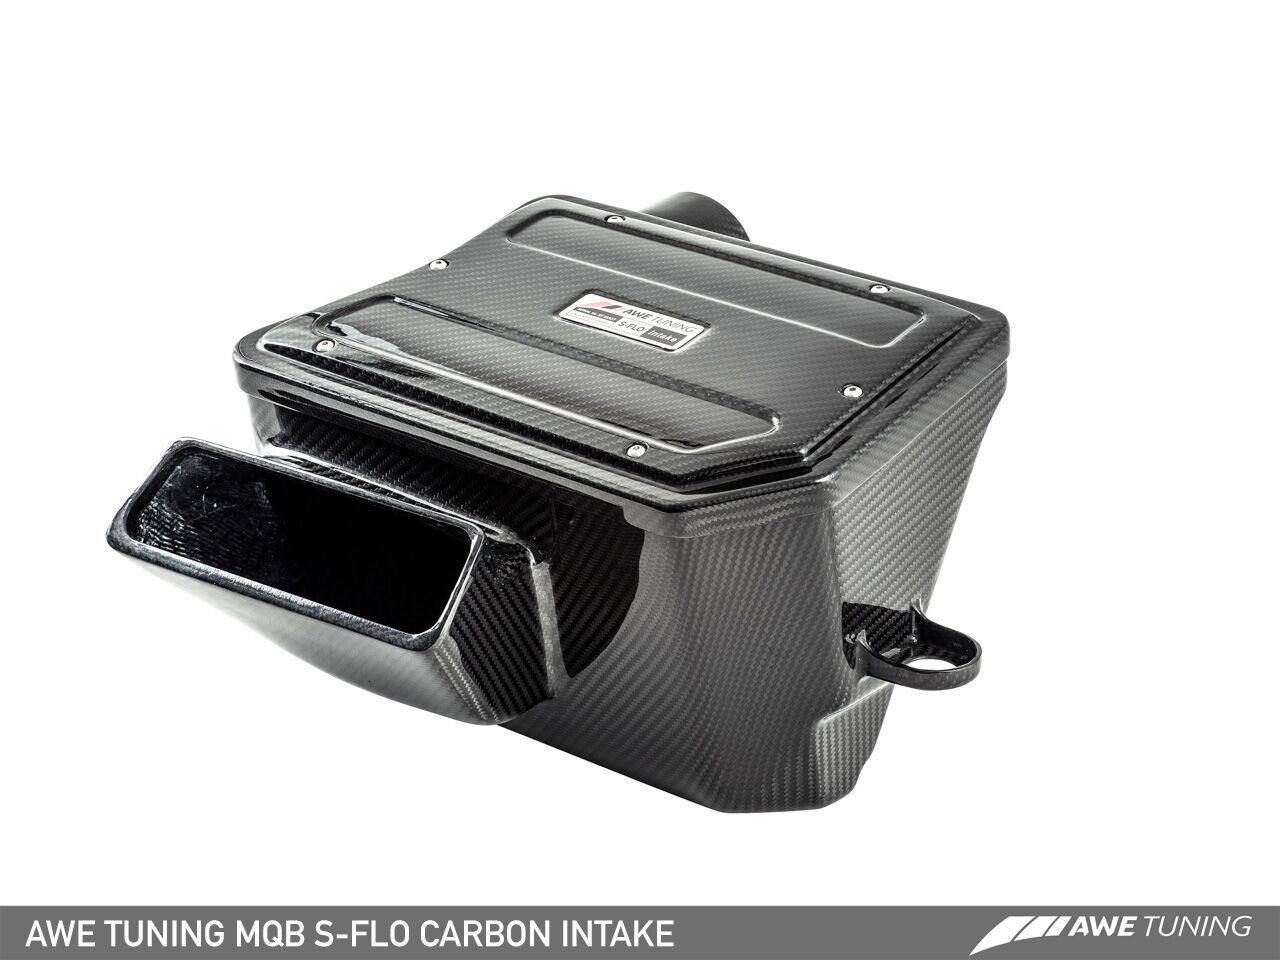 MQB Sflo carbon 3 AWE Now Able To Supply Advanced Carbon Fibre S FLO Intake Kit For MQB 1.8/2.0TFSI